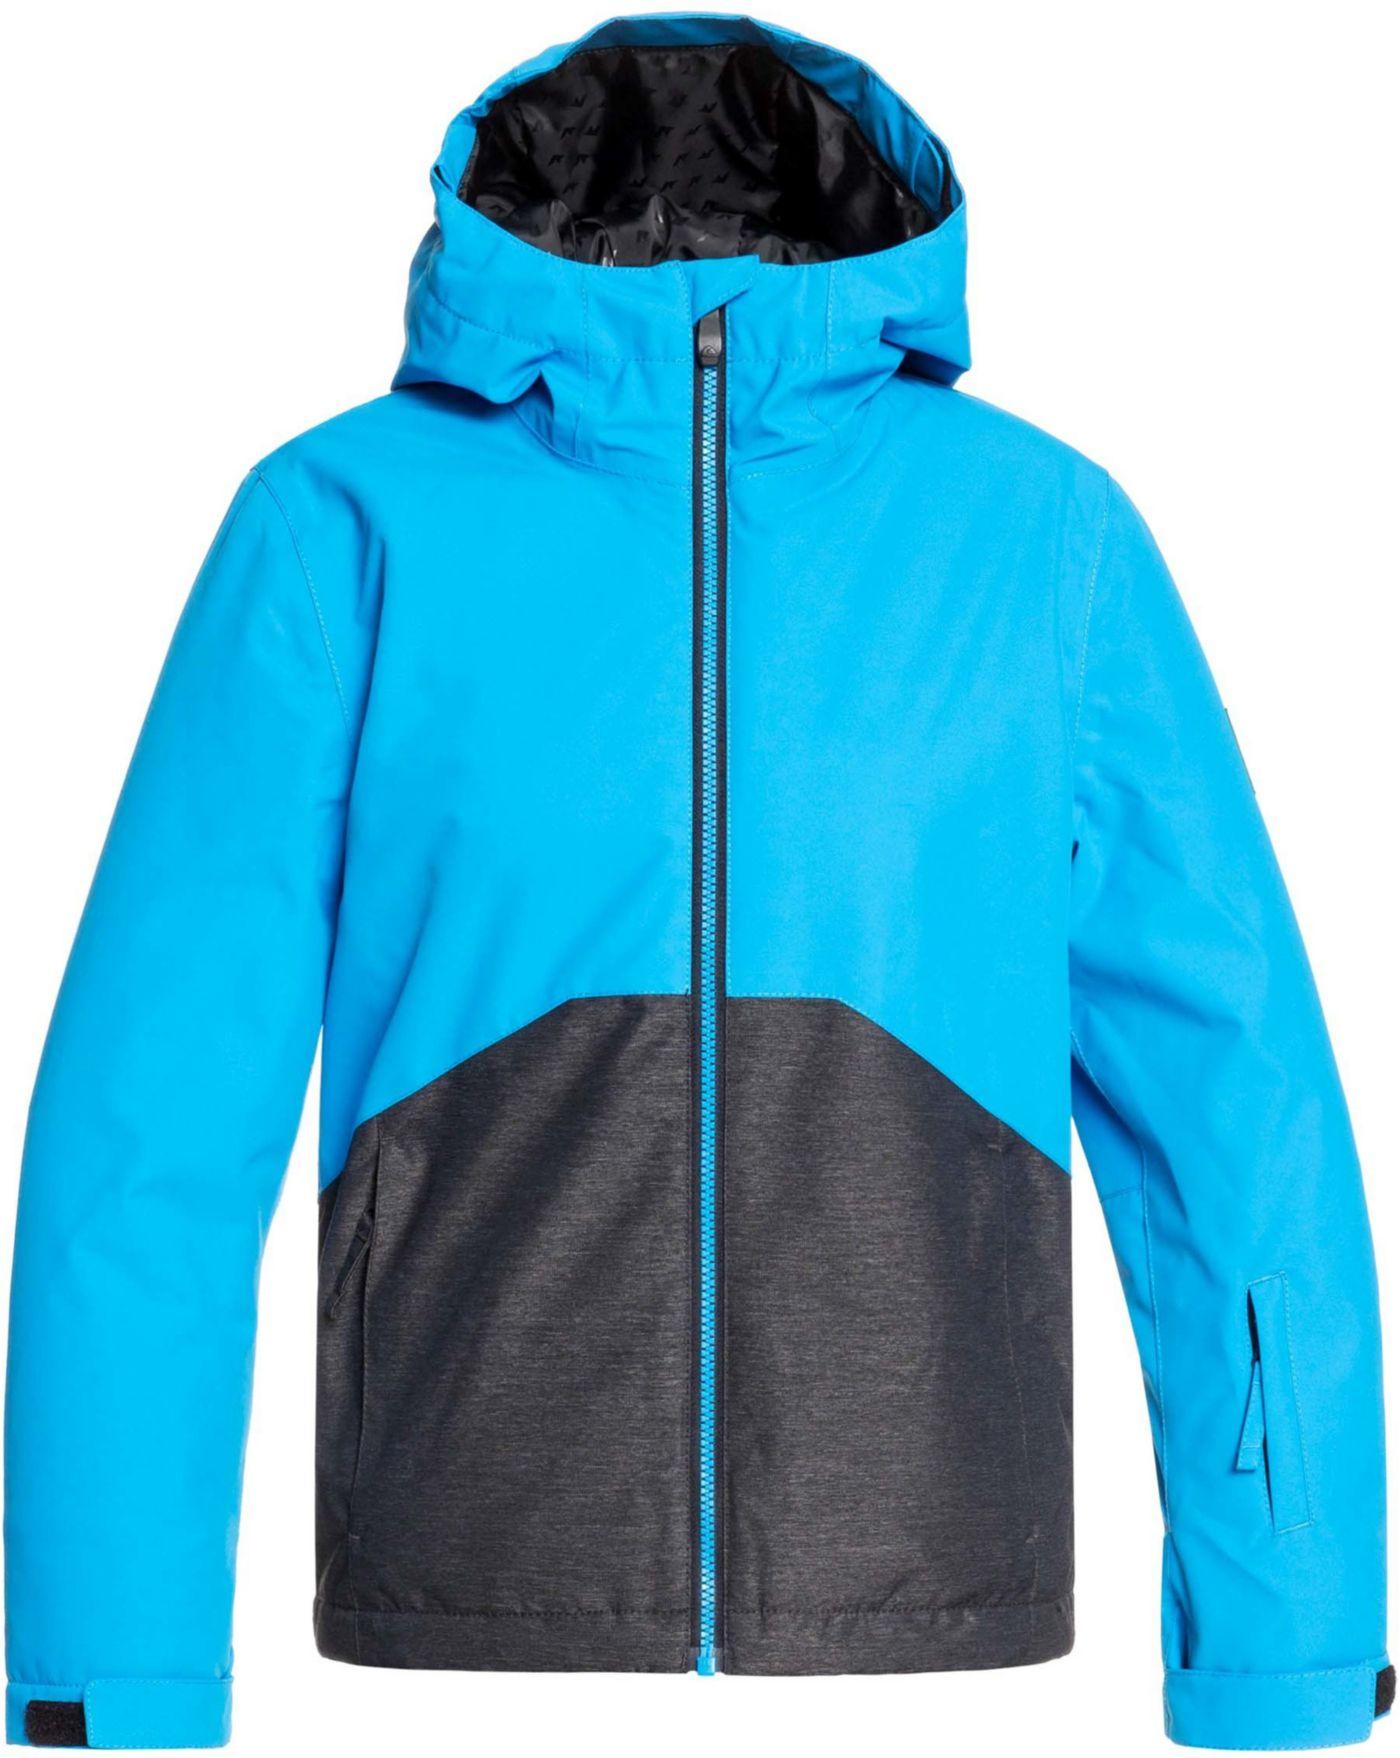 Quiksilver Boys' Sierra Insulated Snow Jacket